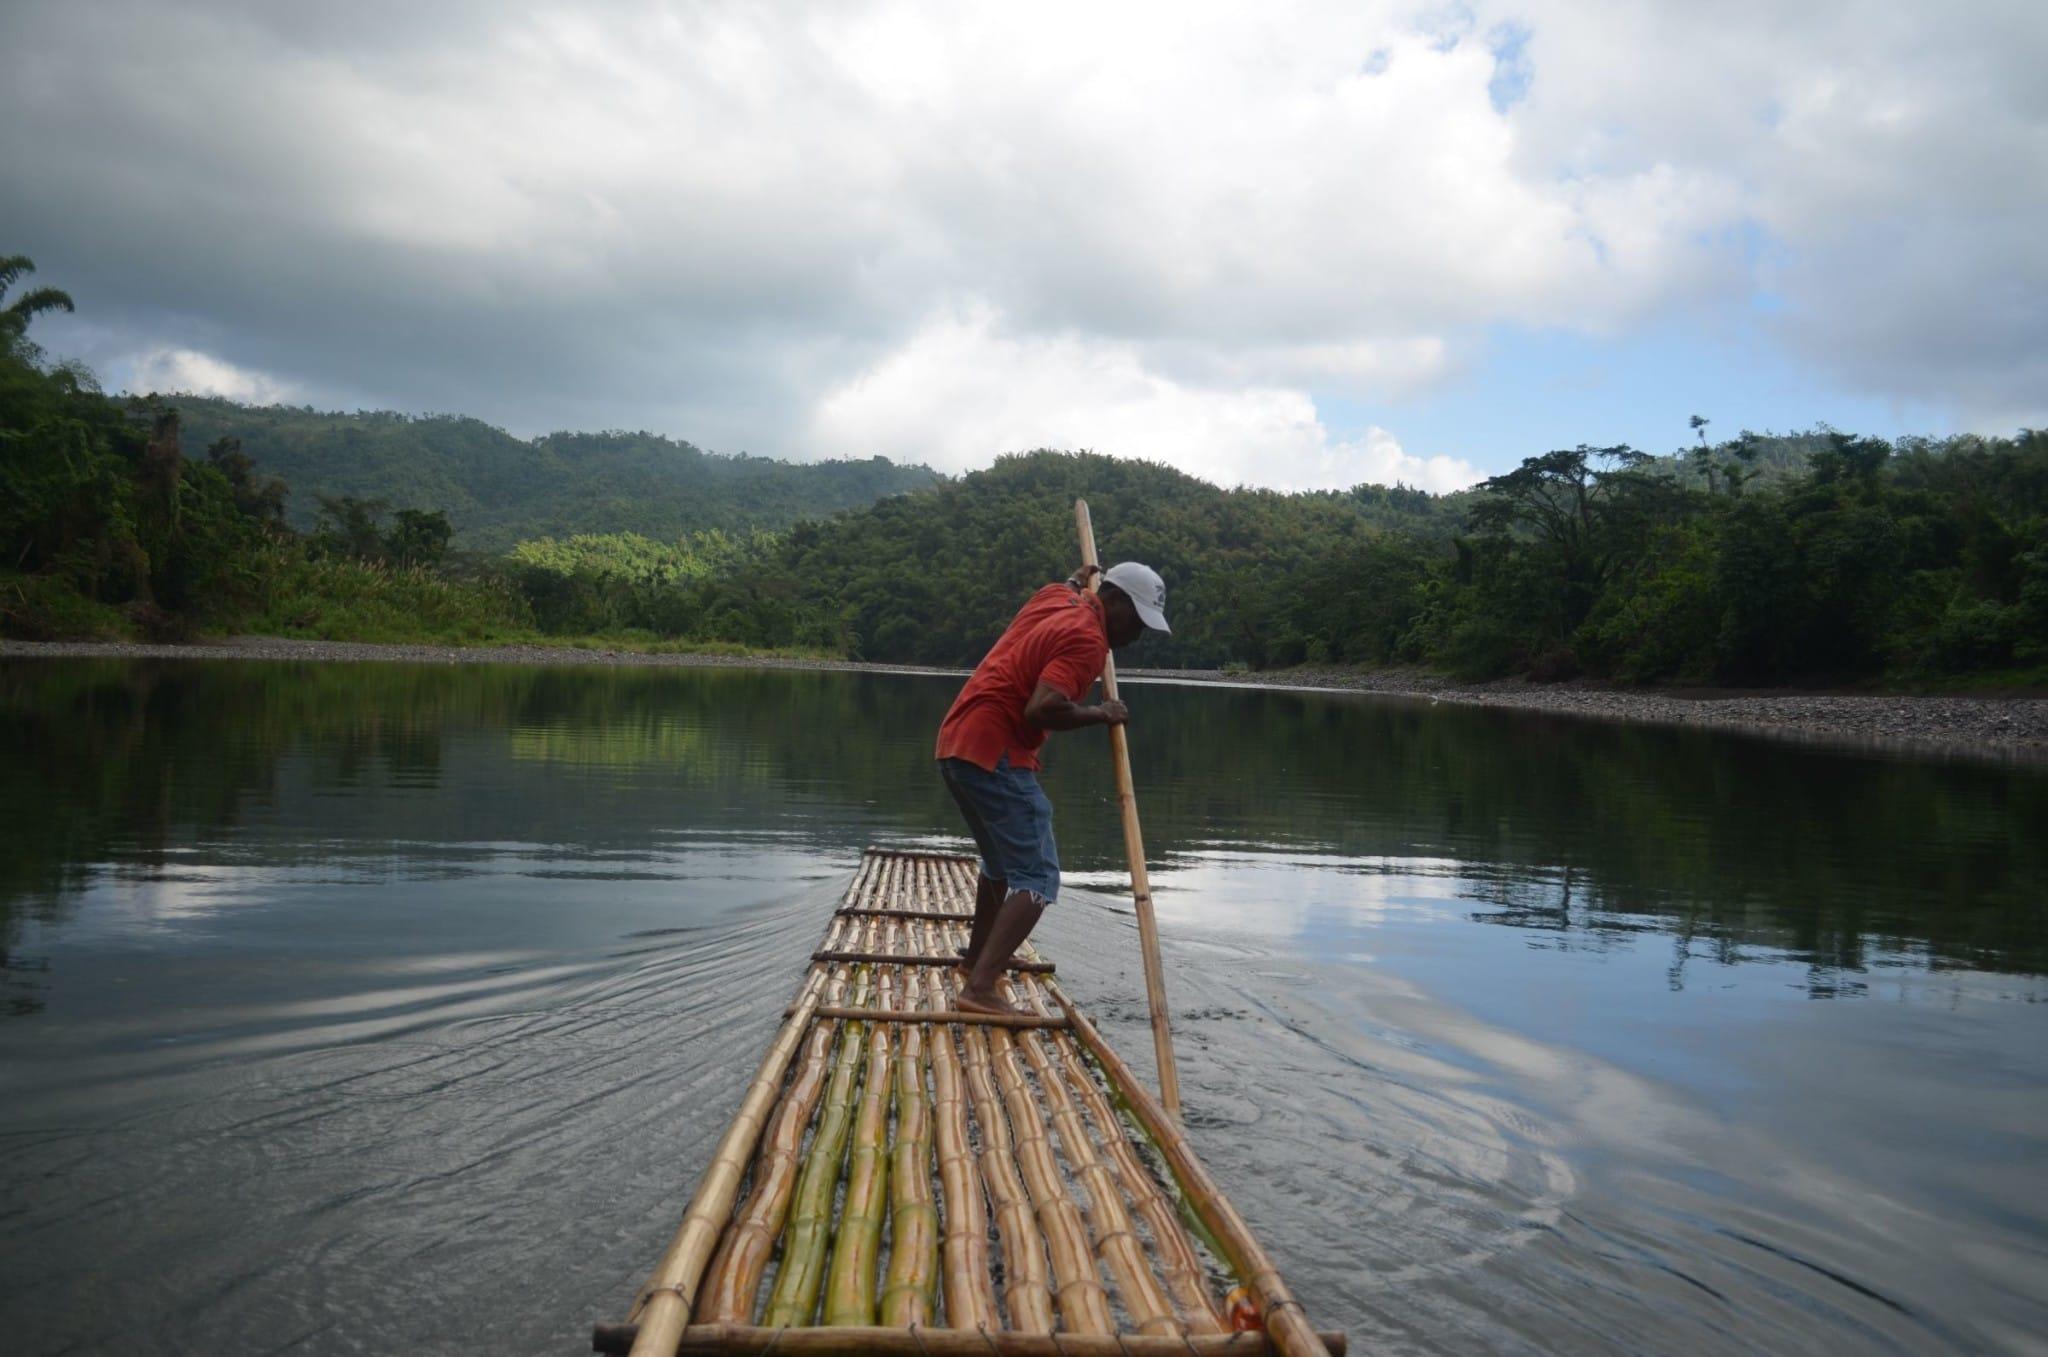 River Rafting Through The Real Jamaica in Port Antonio